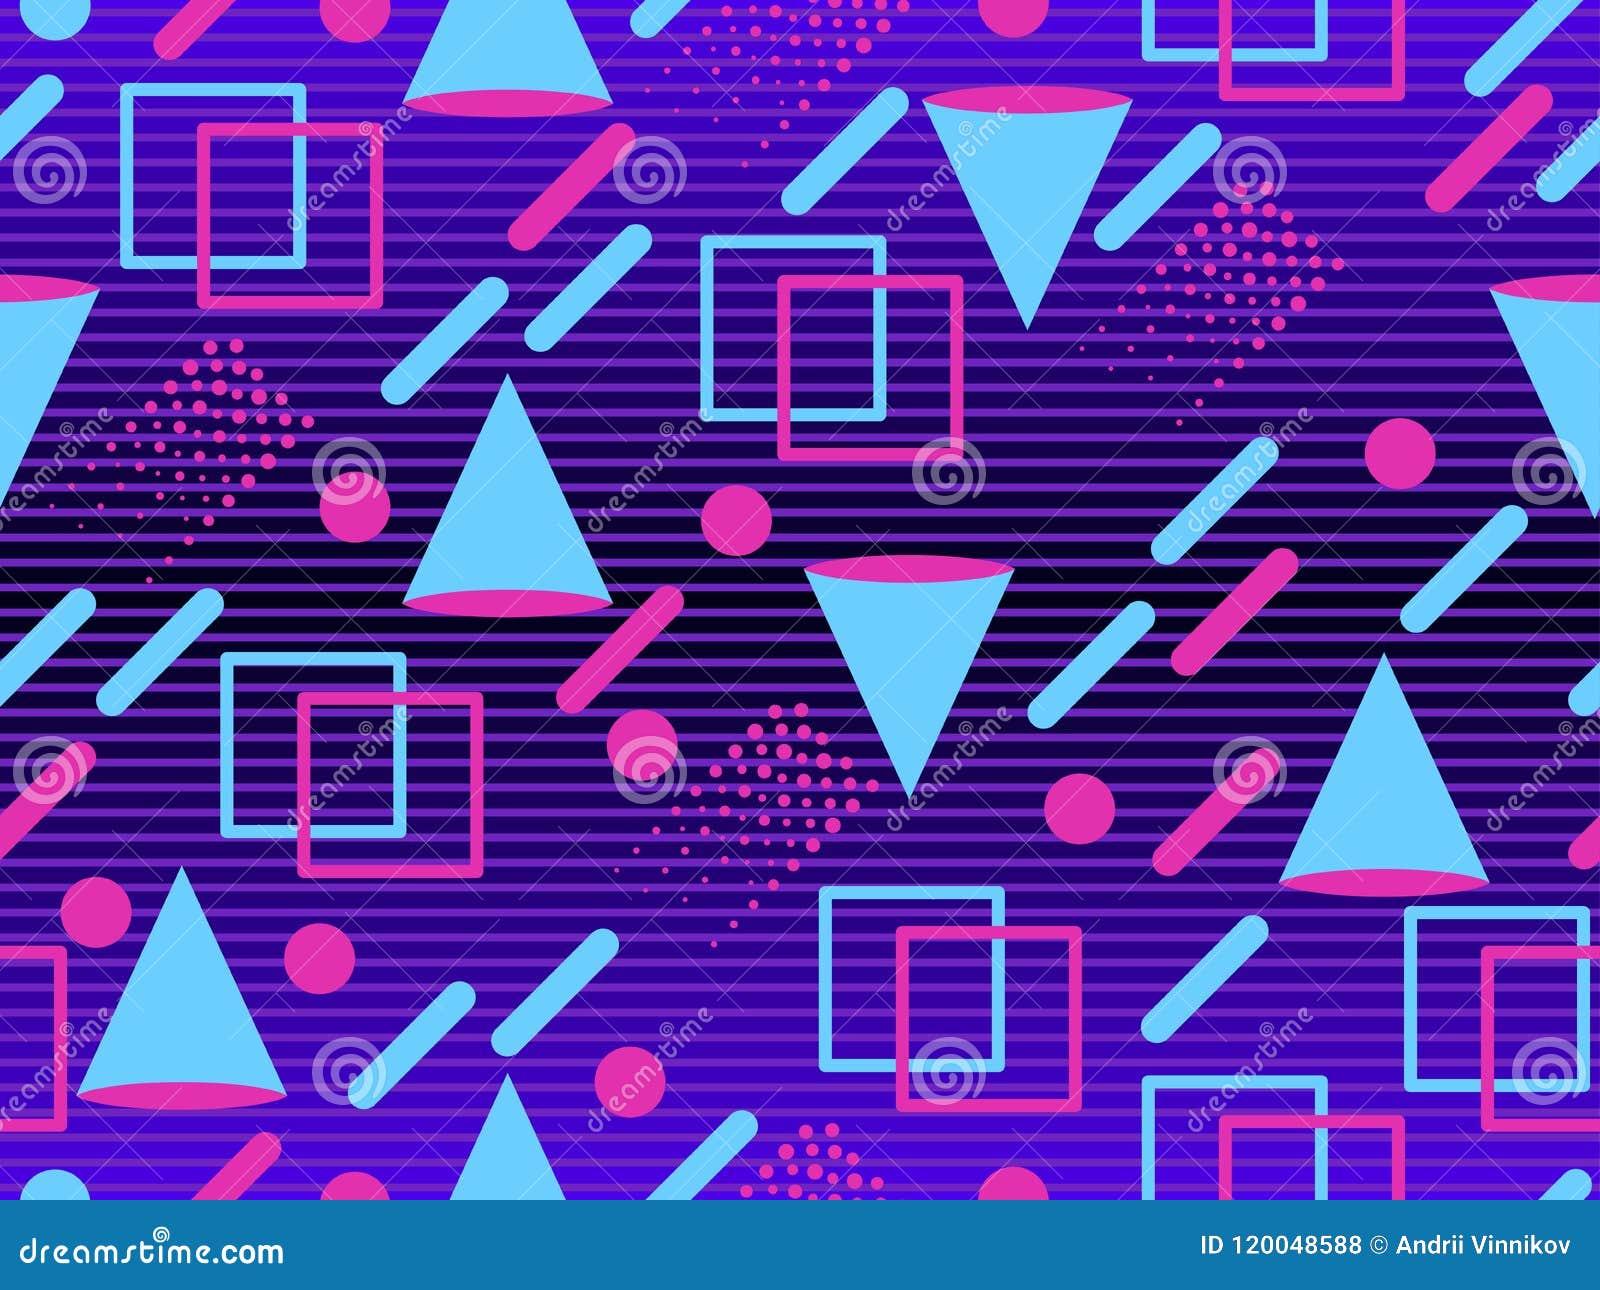 Retro Futurism Seamless Pattern  Geometric Elements Memphis In The